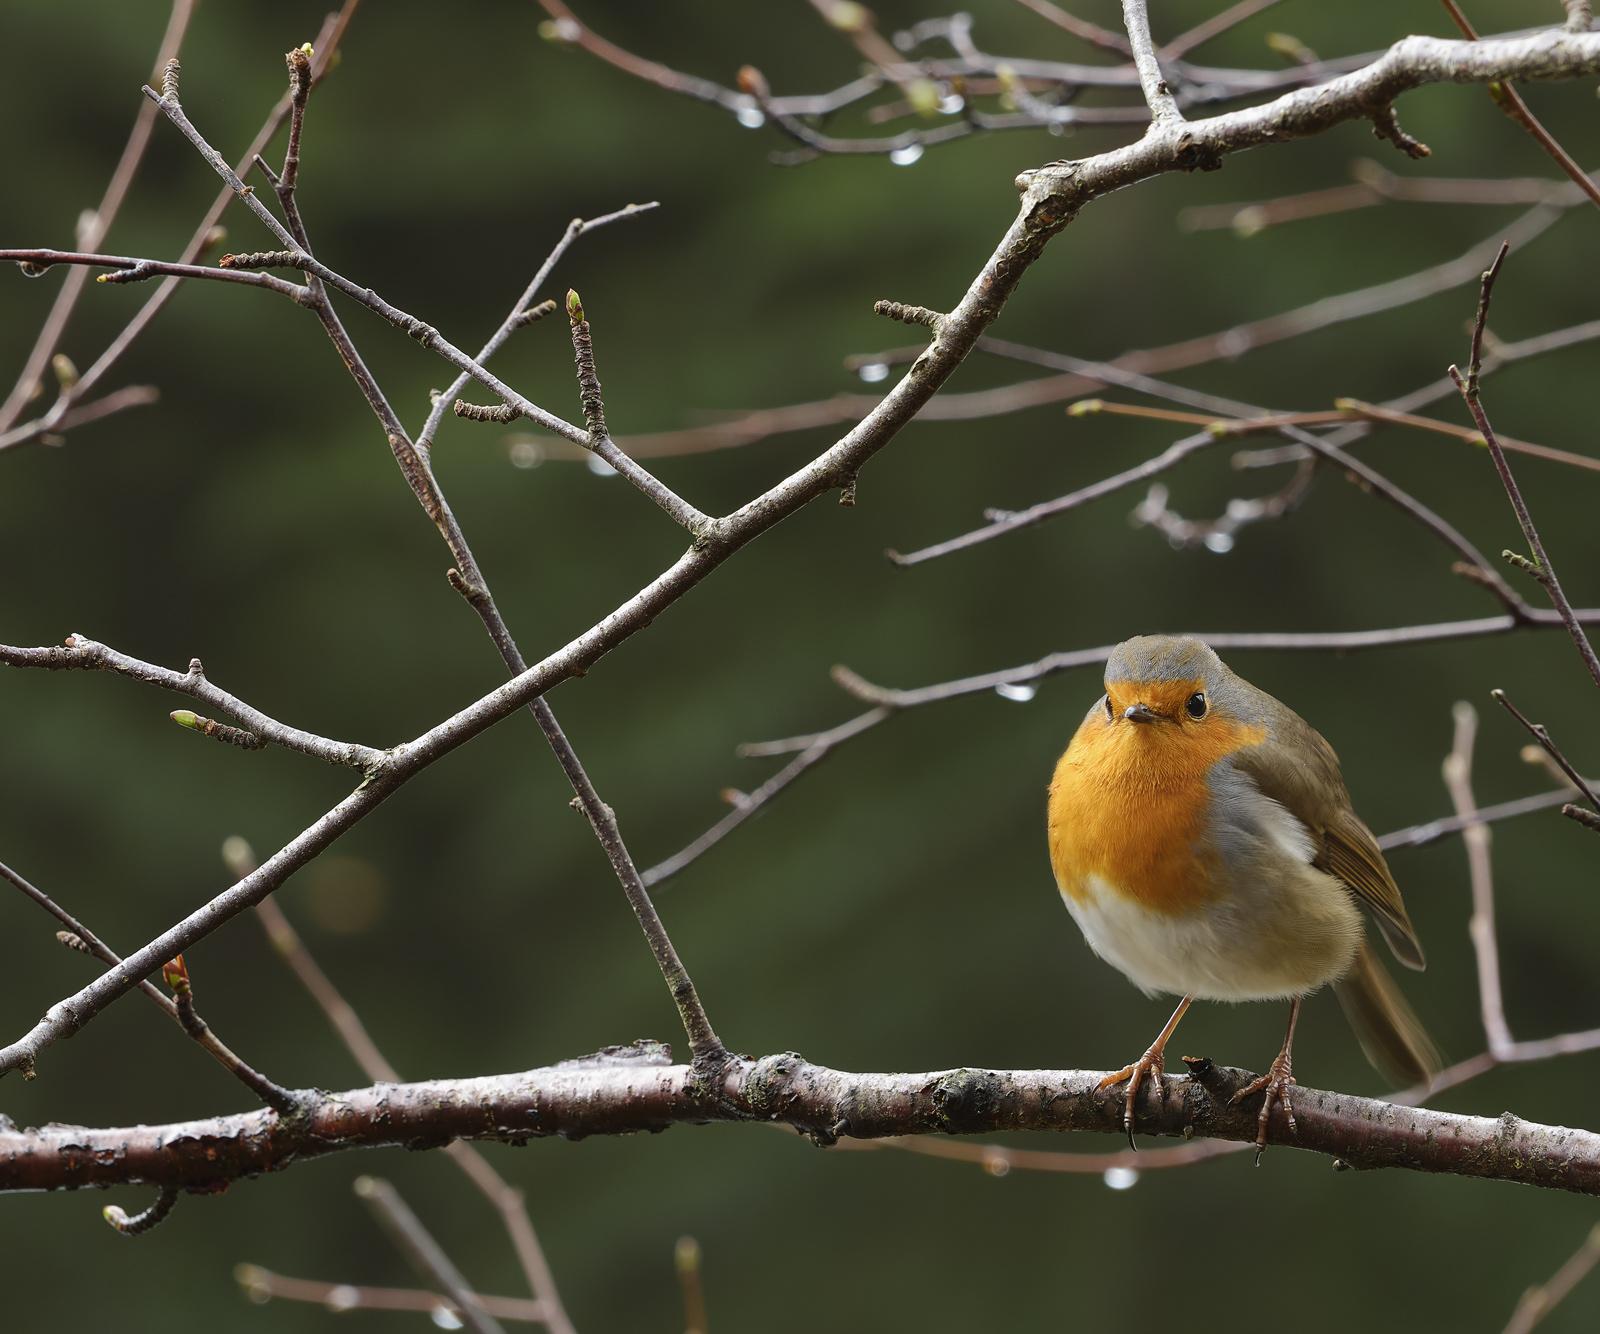 Fat Robin, Glencoe Lochan, Glencoe, Scotland, portly, grotty, damp, autumn, twigs, rain, segment, crisp, photo